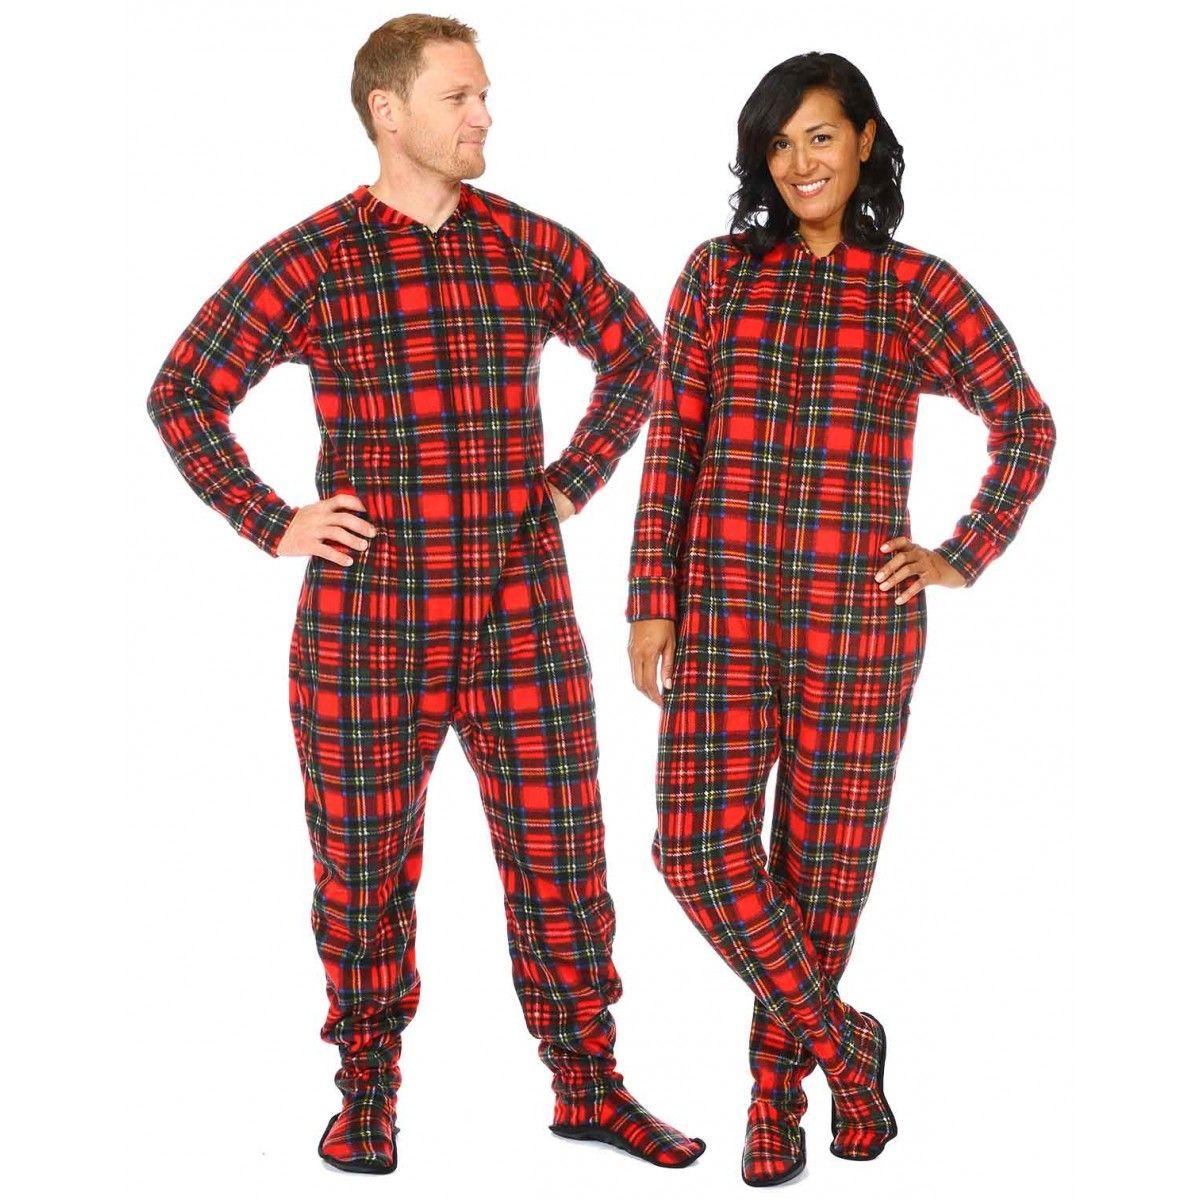 Christmas Plaid Adult Footed Pajama Adult footed pajamas